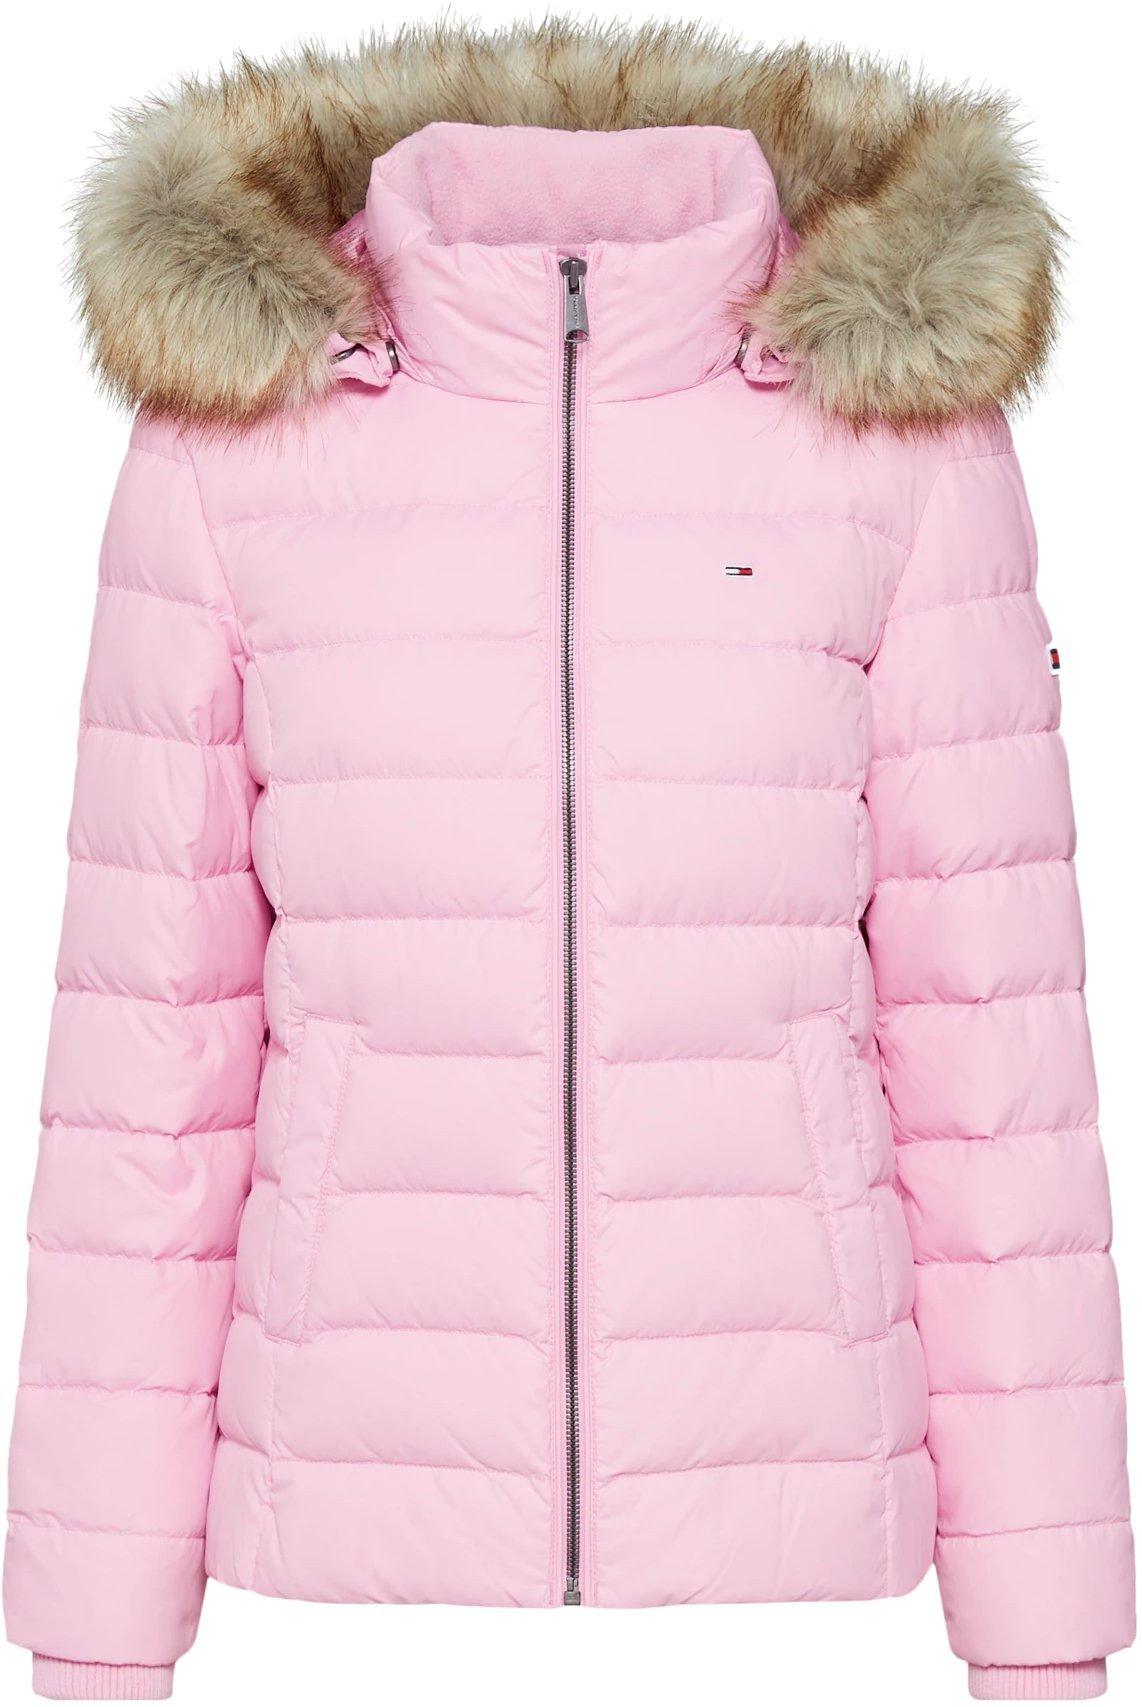 Tommy Hilfiger Essential Hooded Down Jacket pink (DW0DW06774)